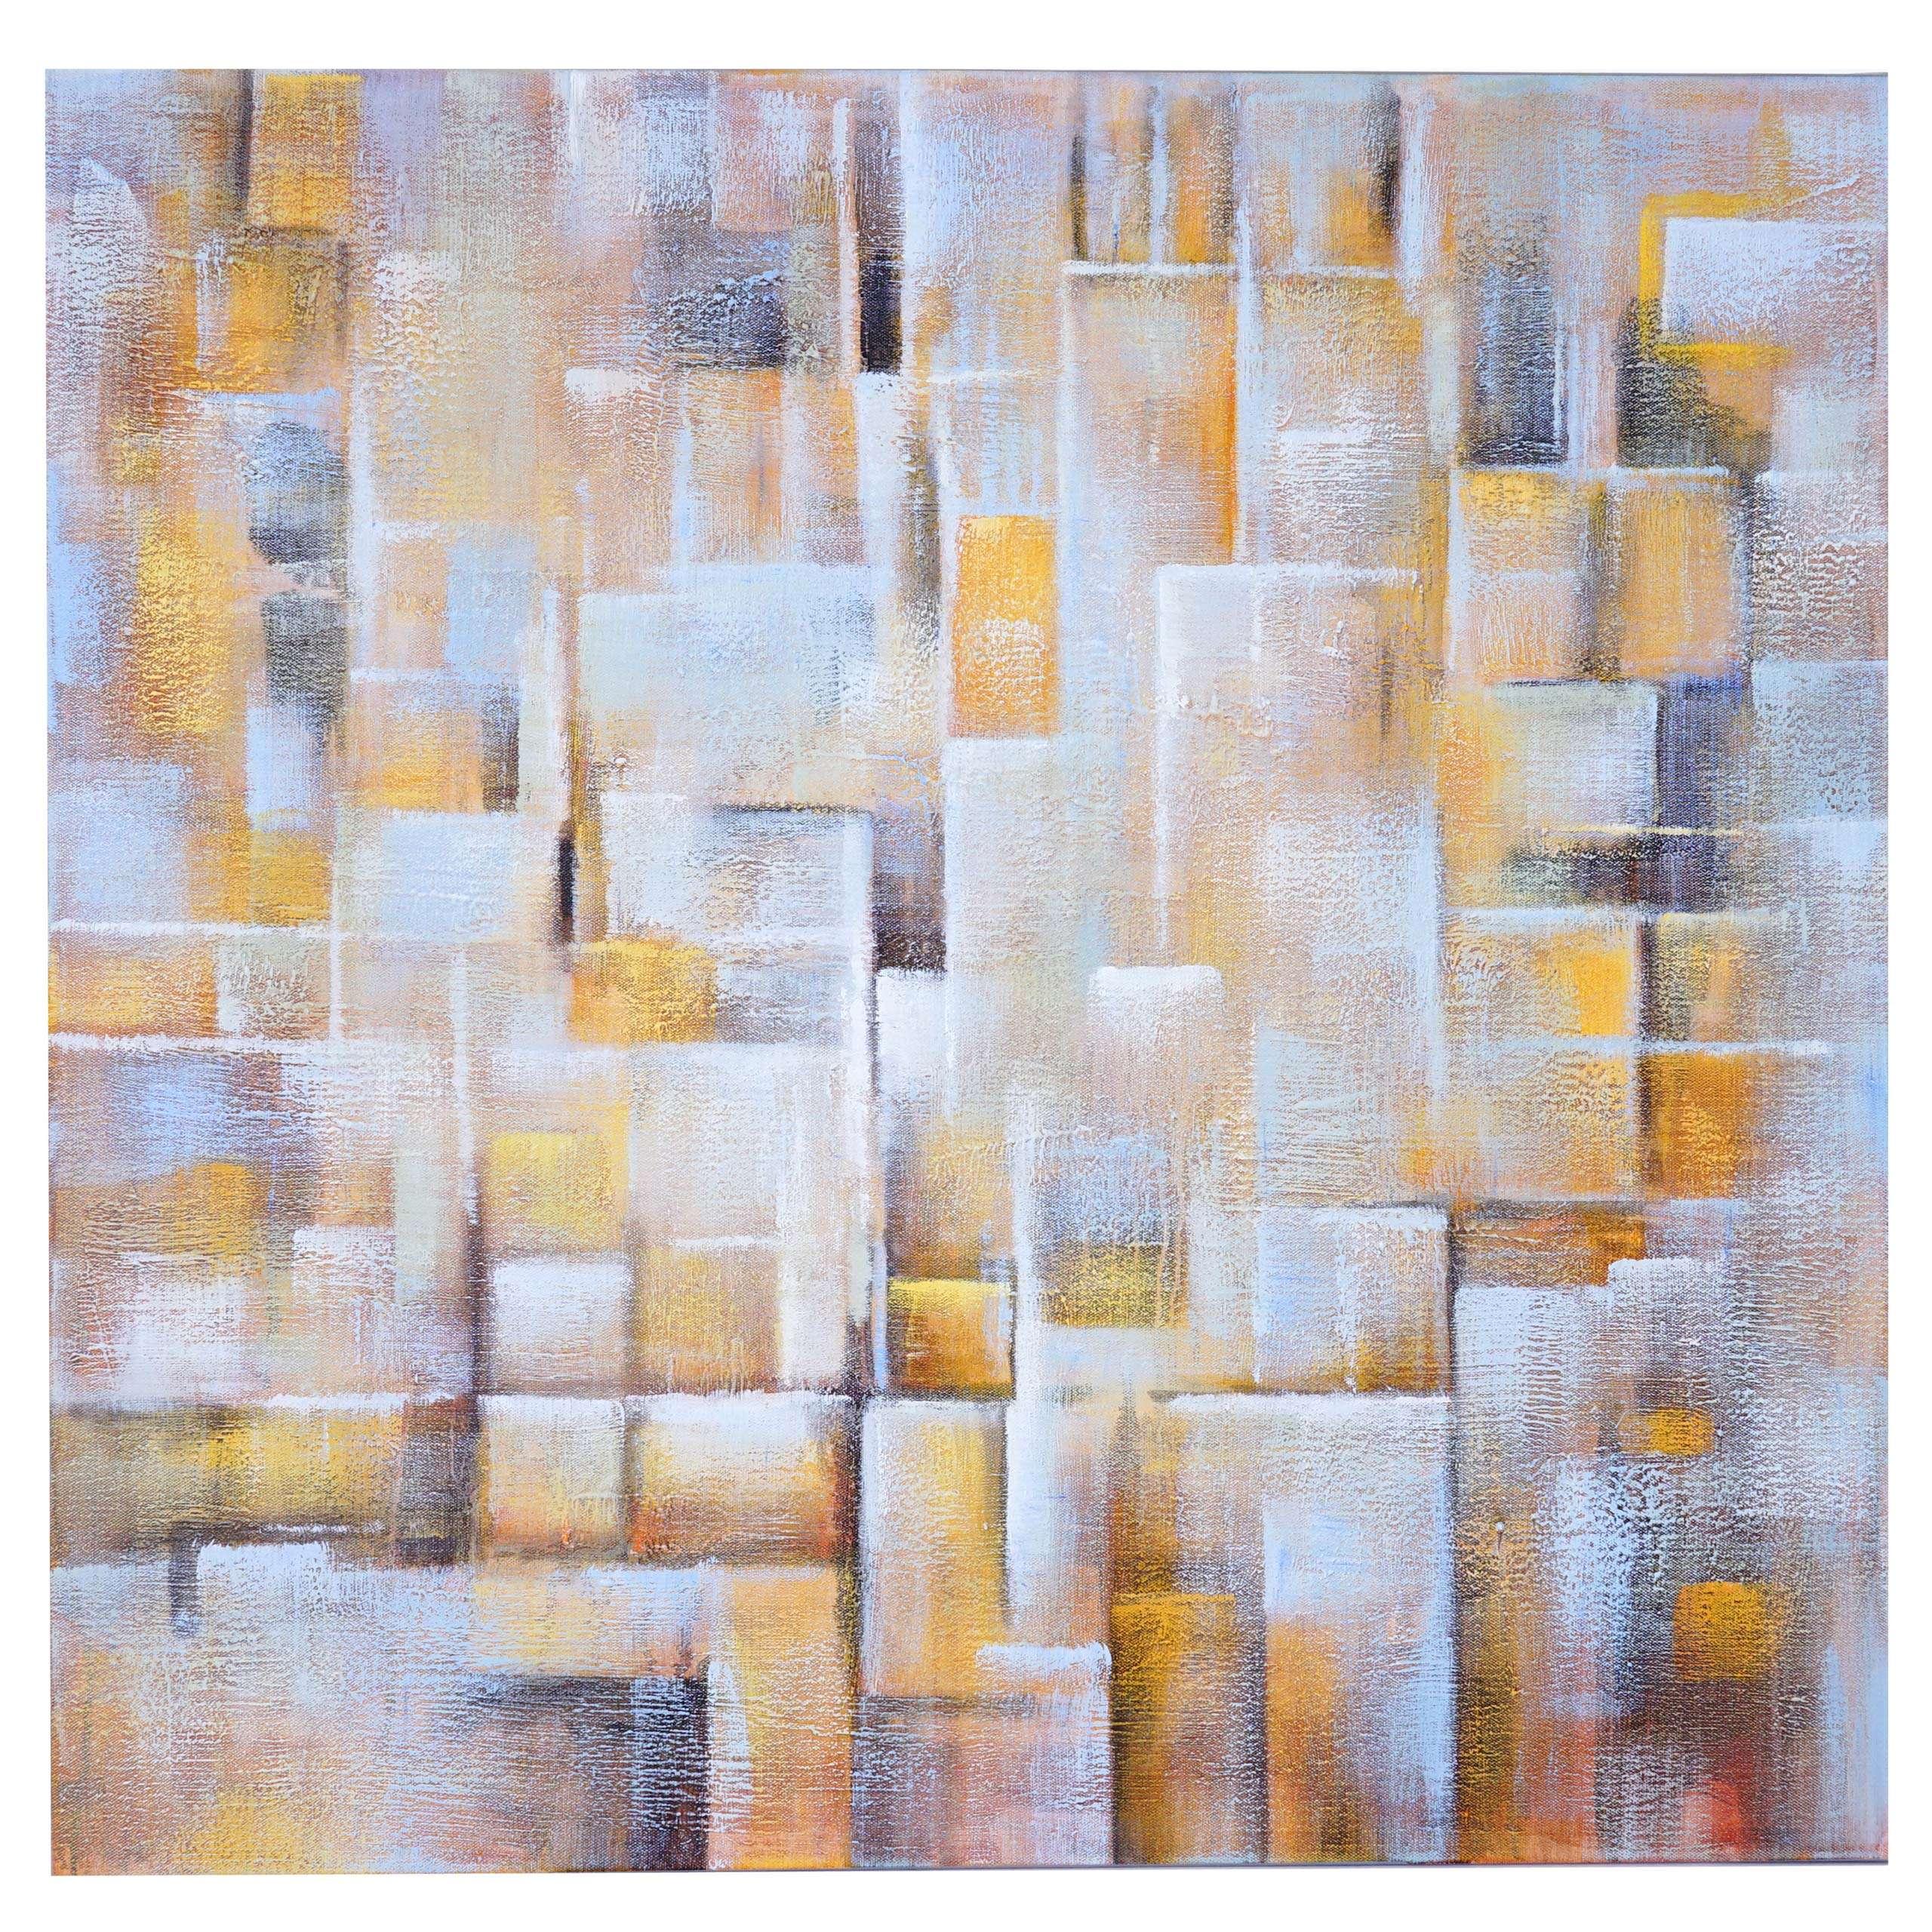 Mendler Ölgemälde Cubes, 100% handgemaltes Wandbild Gemälde XL, 100x100cm ~ Variantenangebot 59446